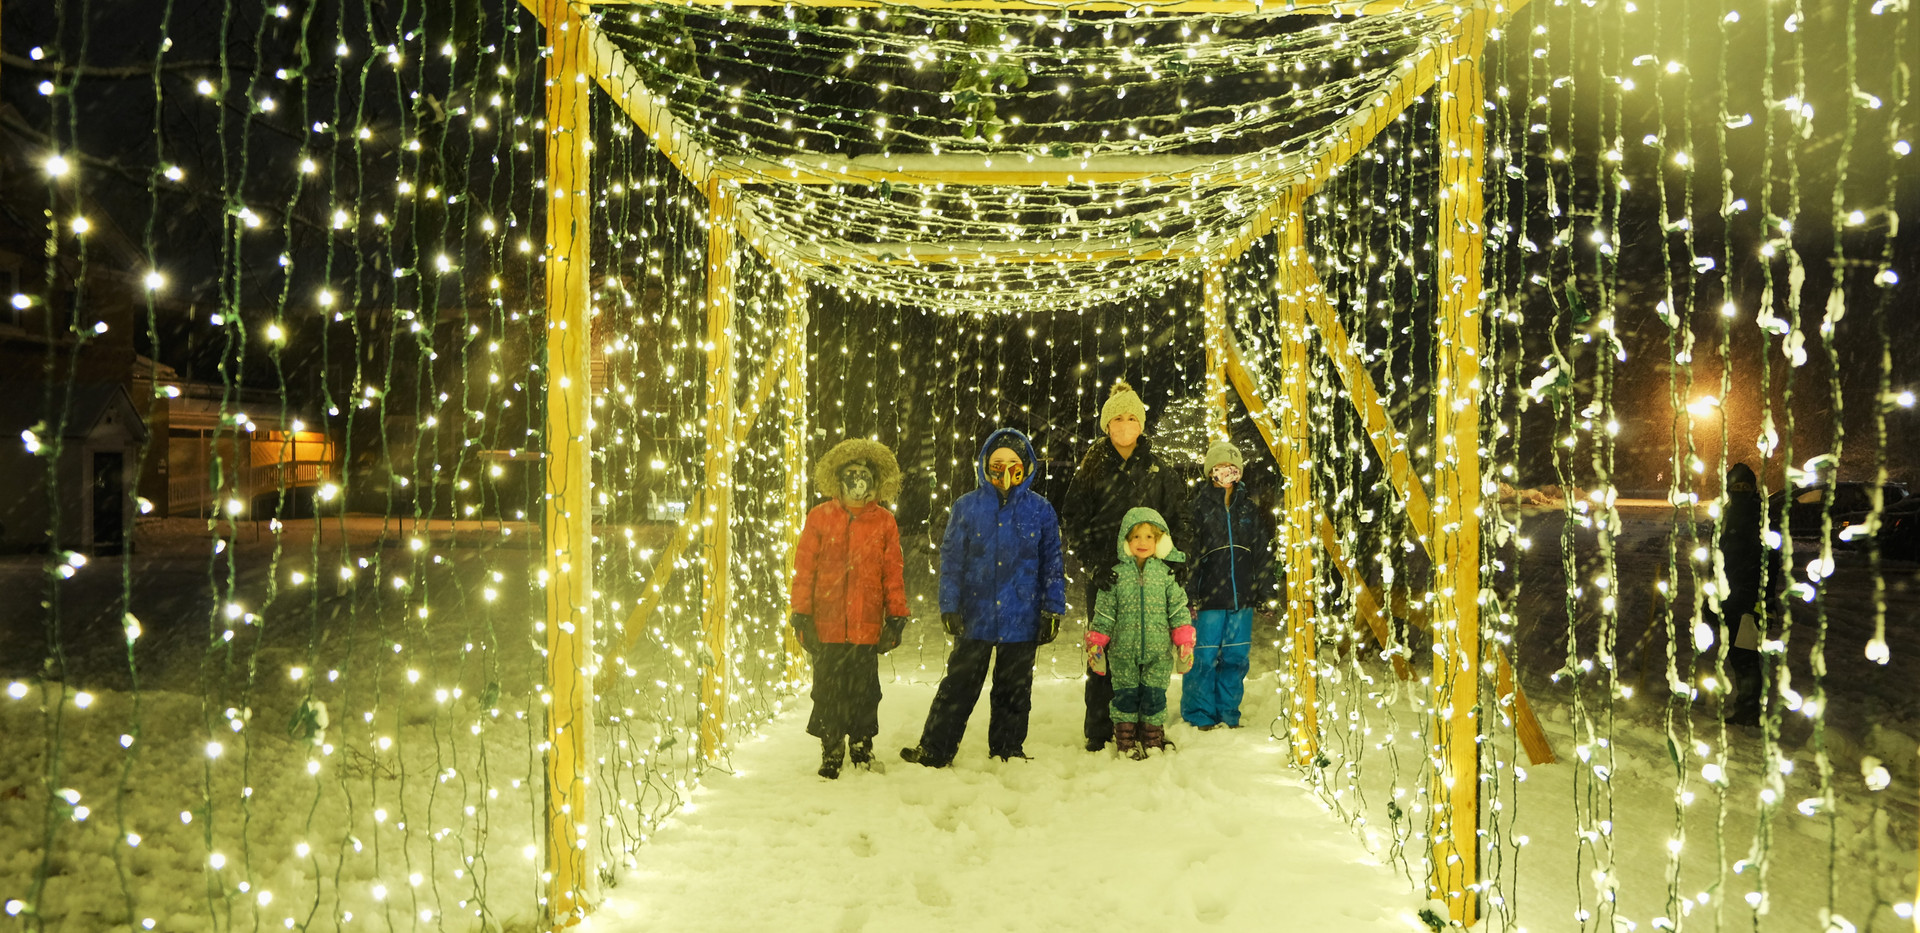 HolidayLights2020_kids_light_tunnel.jpg